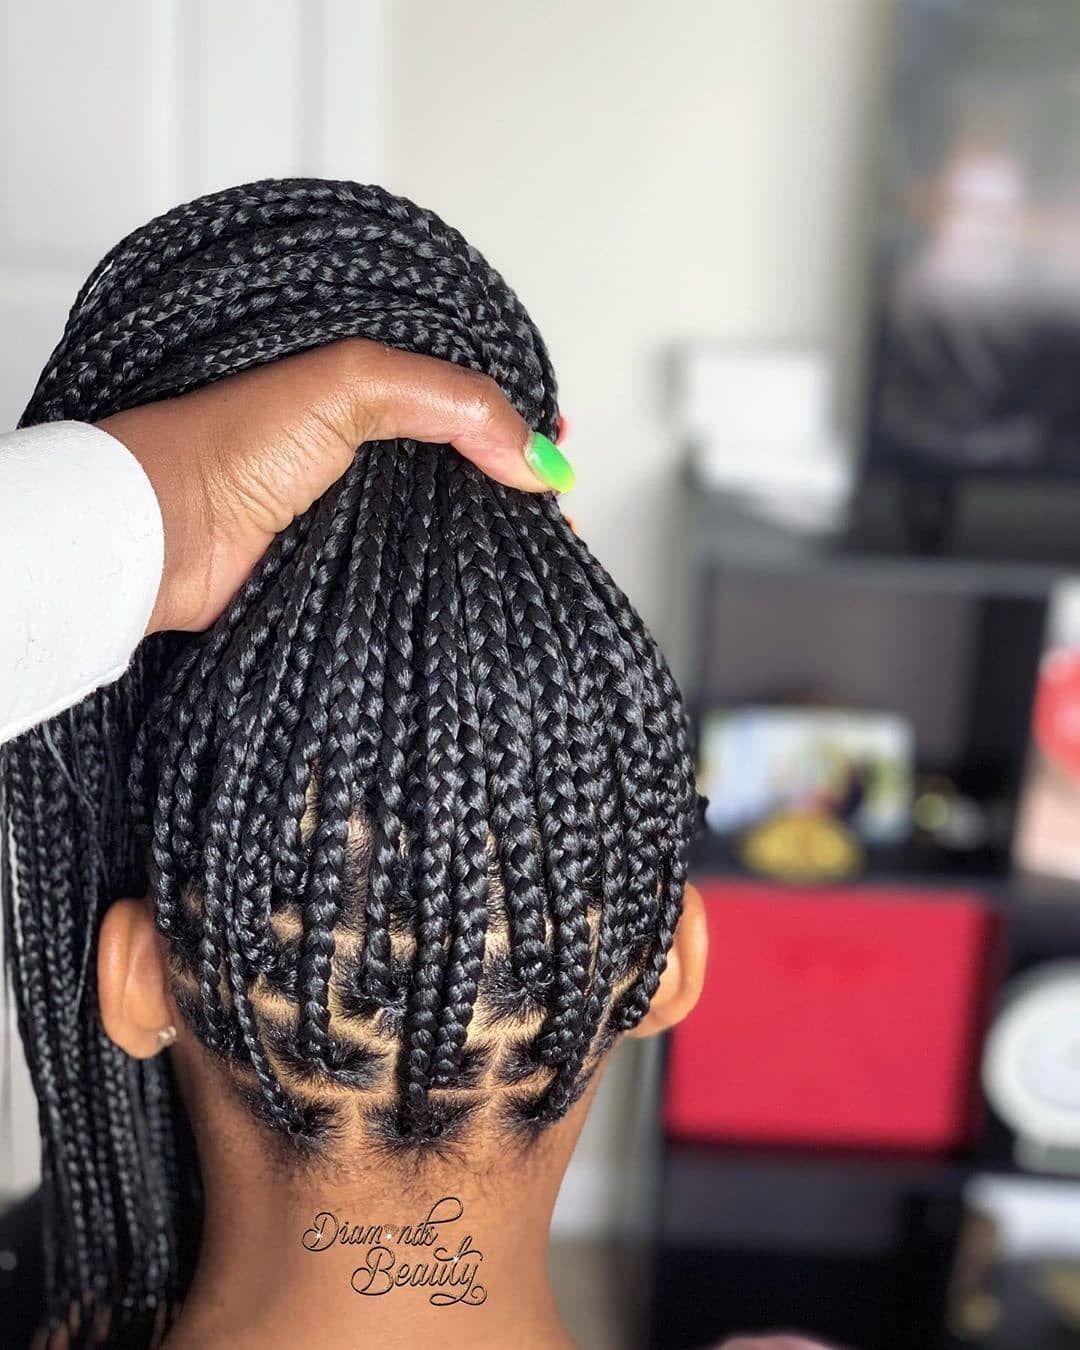 Uly 6 7 2019 On Instagra Single Braids Hairstyles Hair Styles Braided Hairstyles